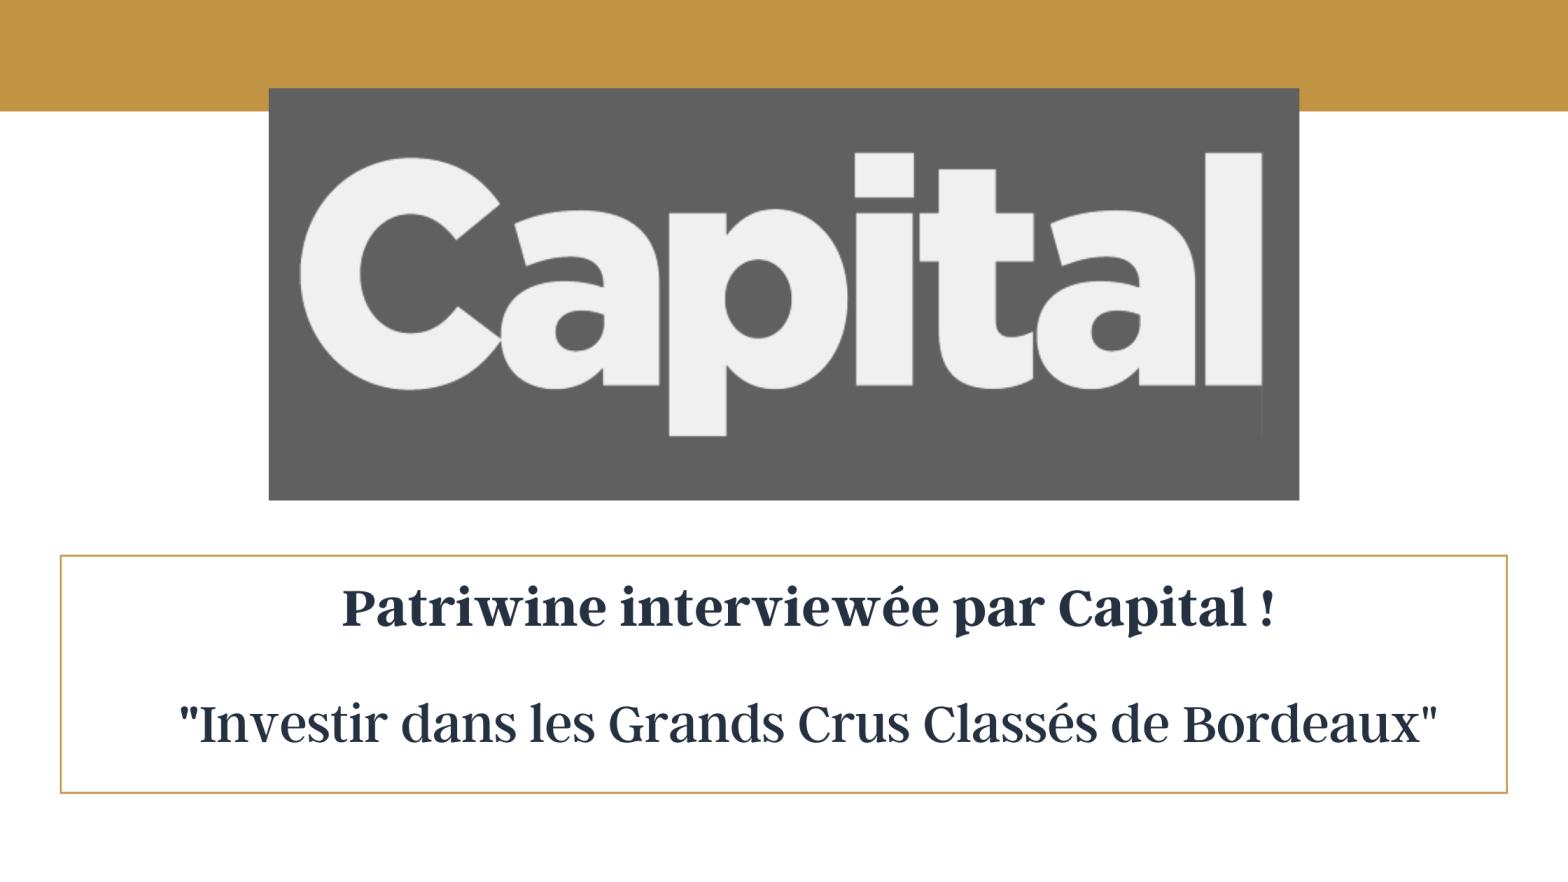 Capital - Patriwine